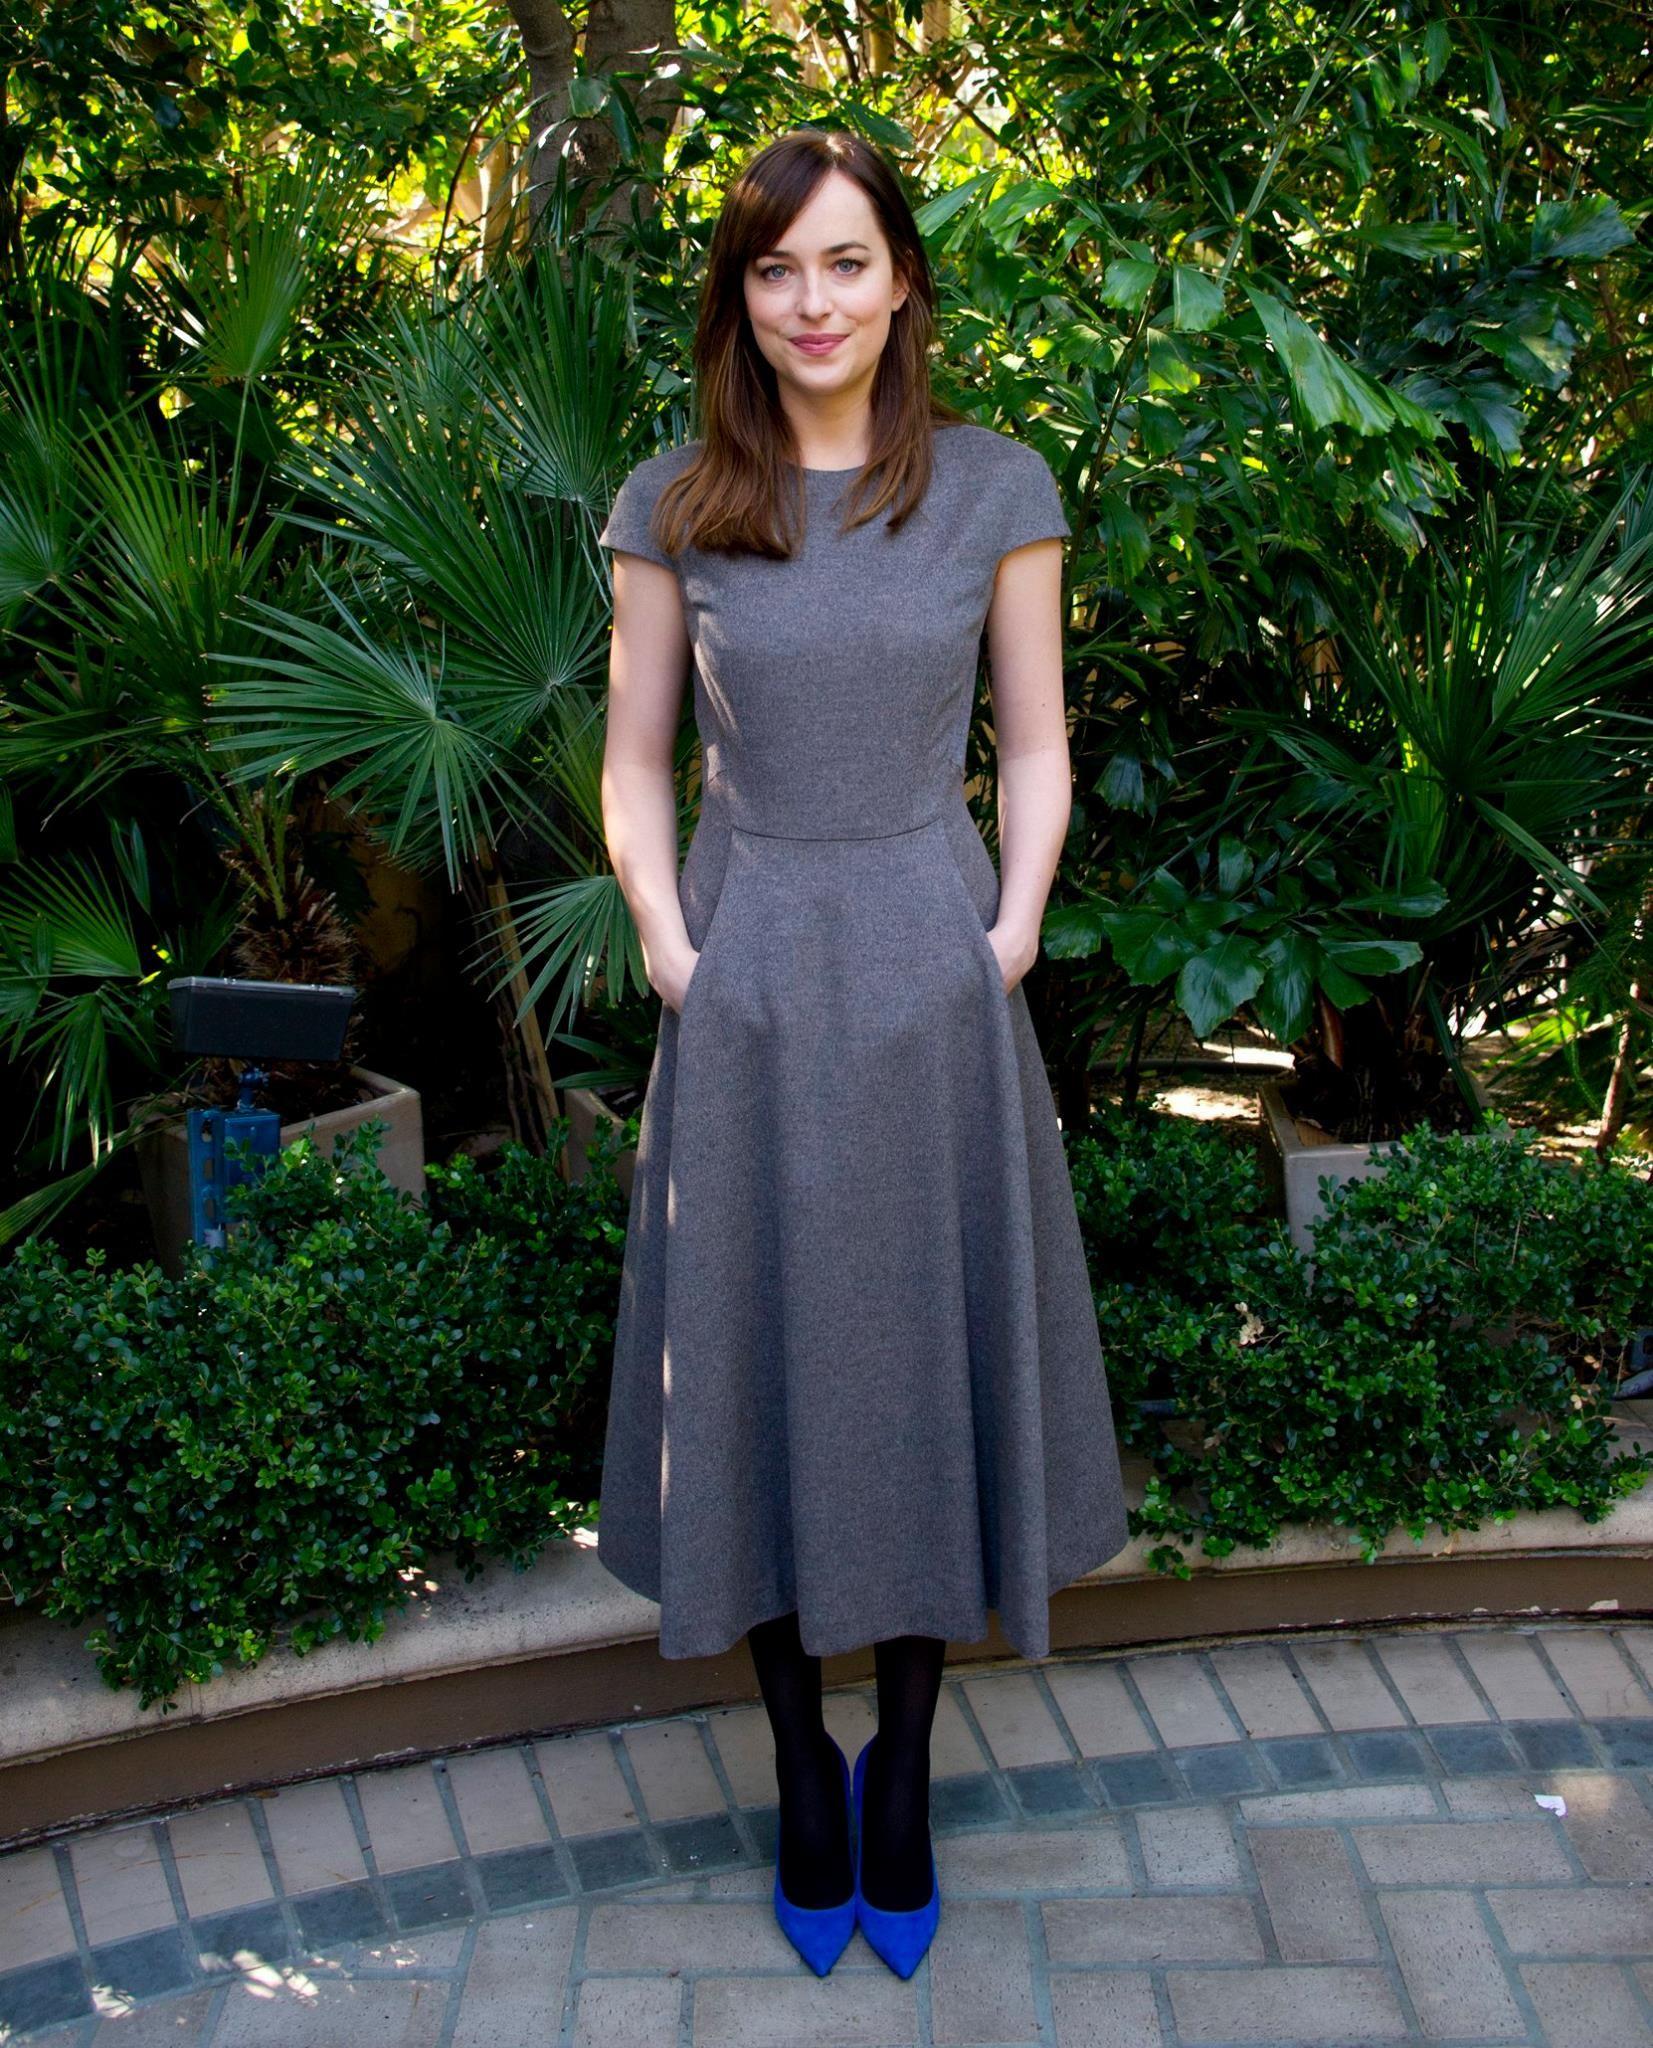 DAKOTA 2015 Dakota johnson style, Hollywood fashion